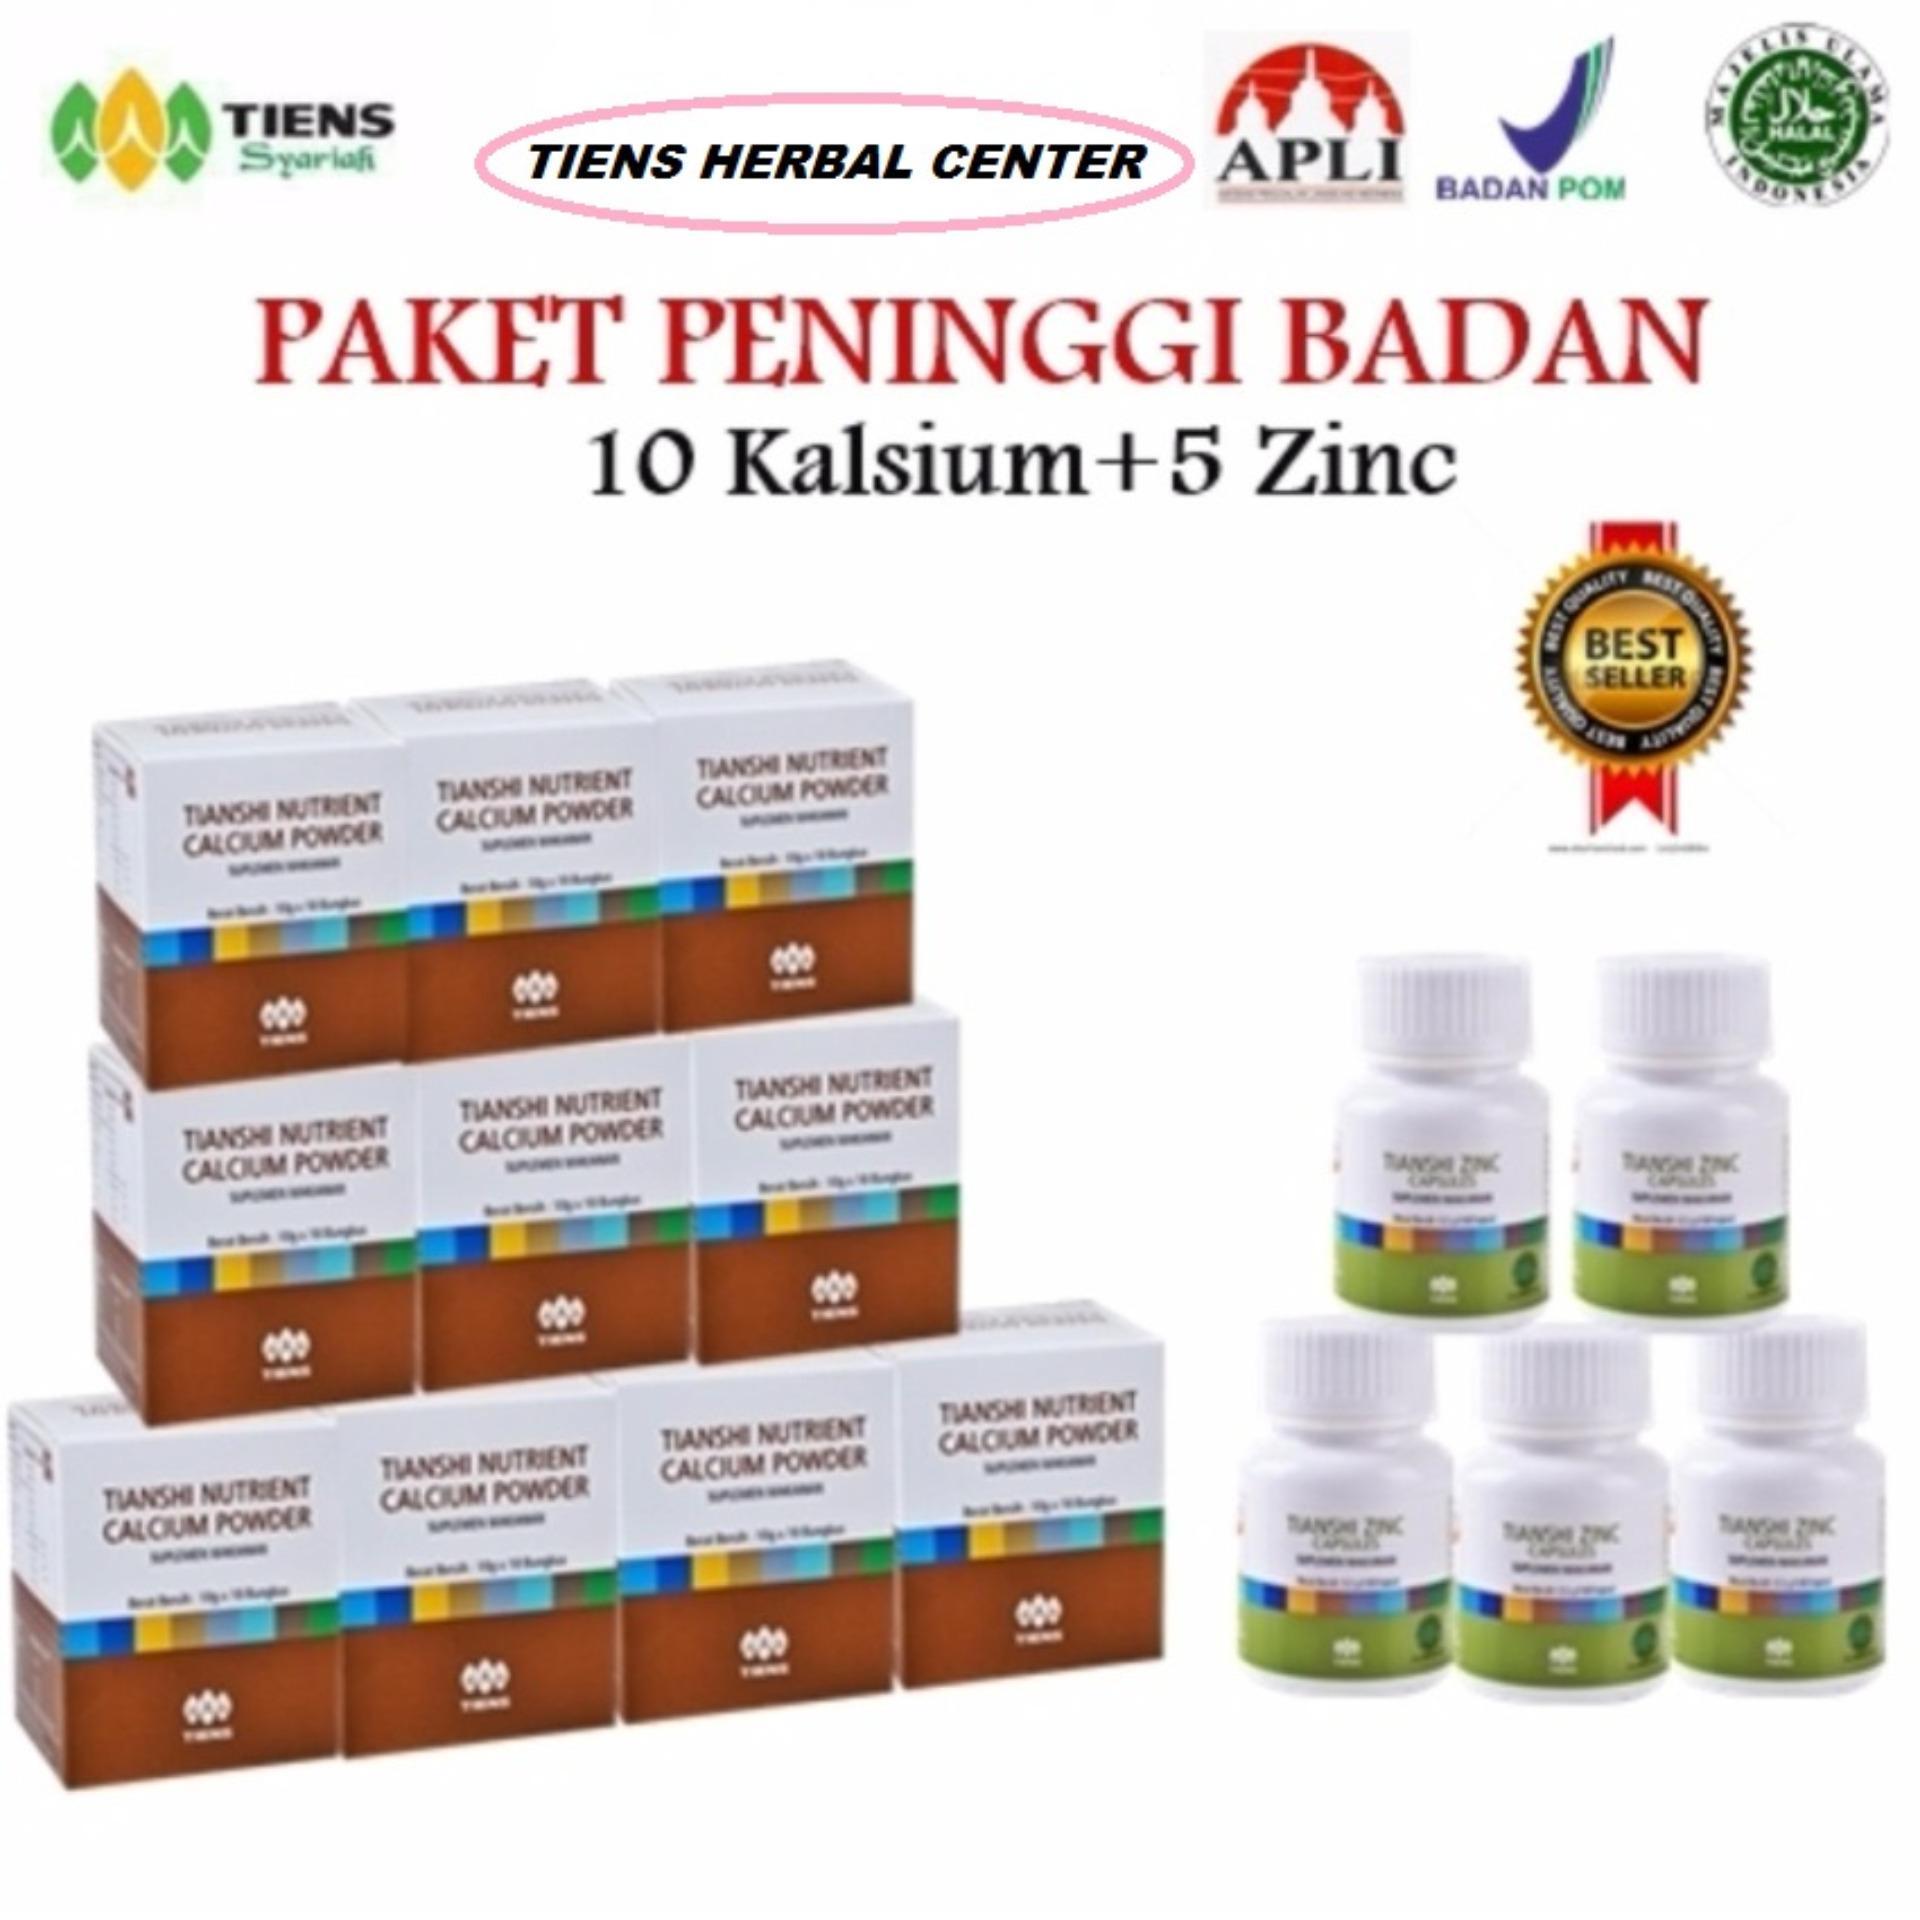 Flash Sale Tiens Peninggi Badan Nutrient High Calsium Powder 10 & zink 5